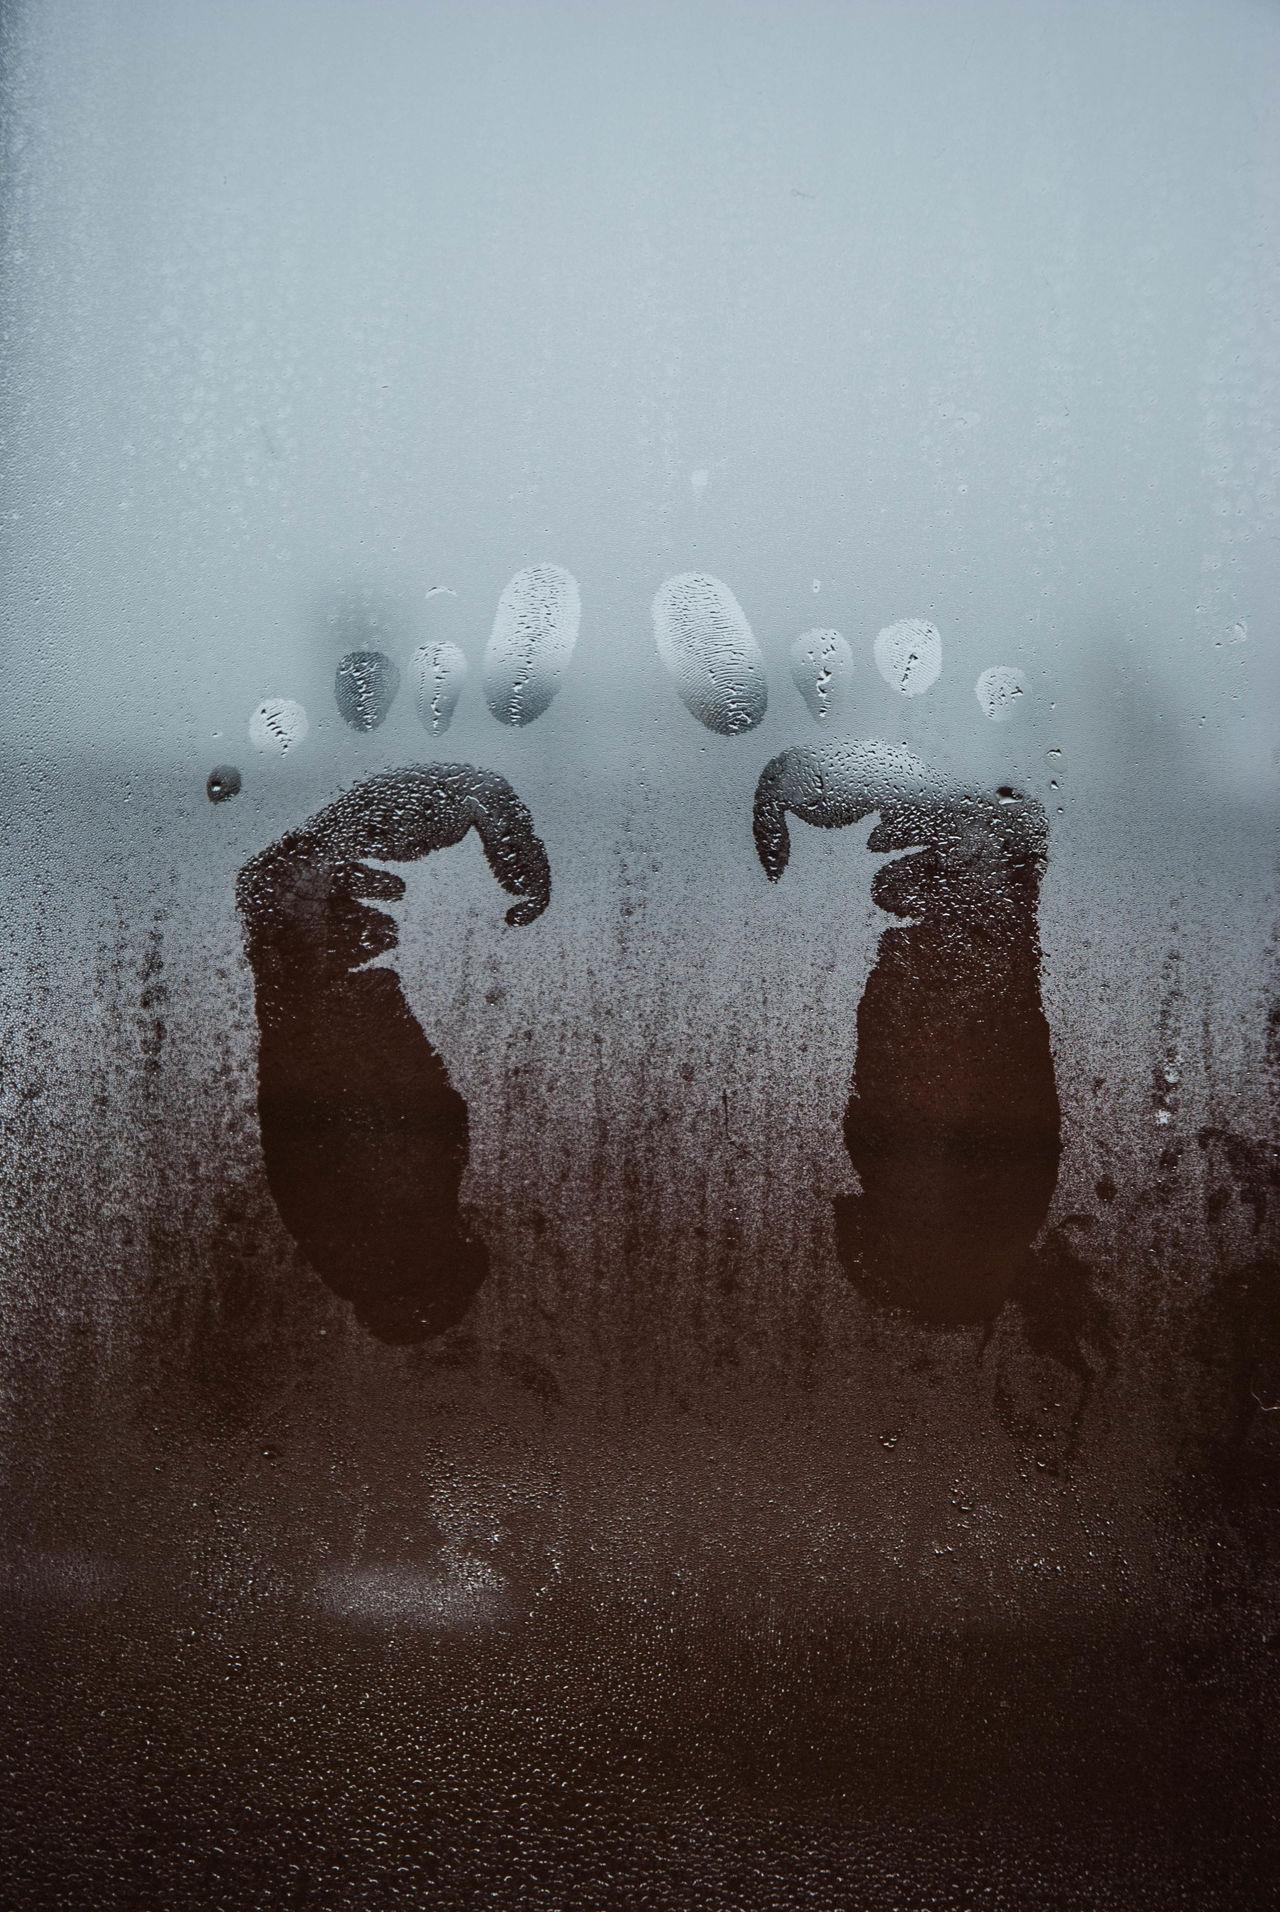 Impronte Piedini Handmade Human Hand Day Gennaio2017 Italia Bar Ponte Di Legno Window Indoors  Nikon D60 Winter Water Drop Close-up Frosted Glass People